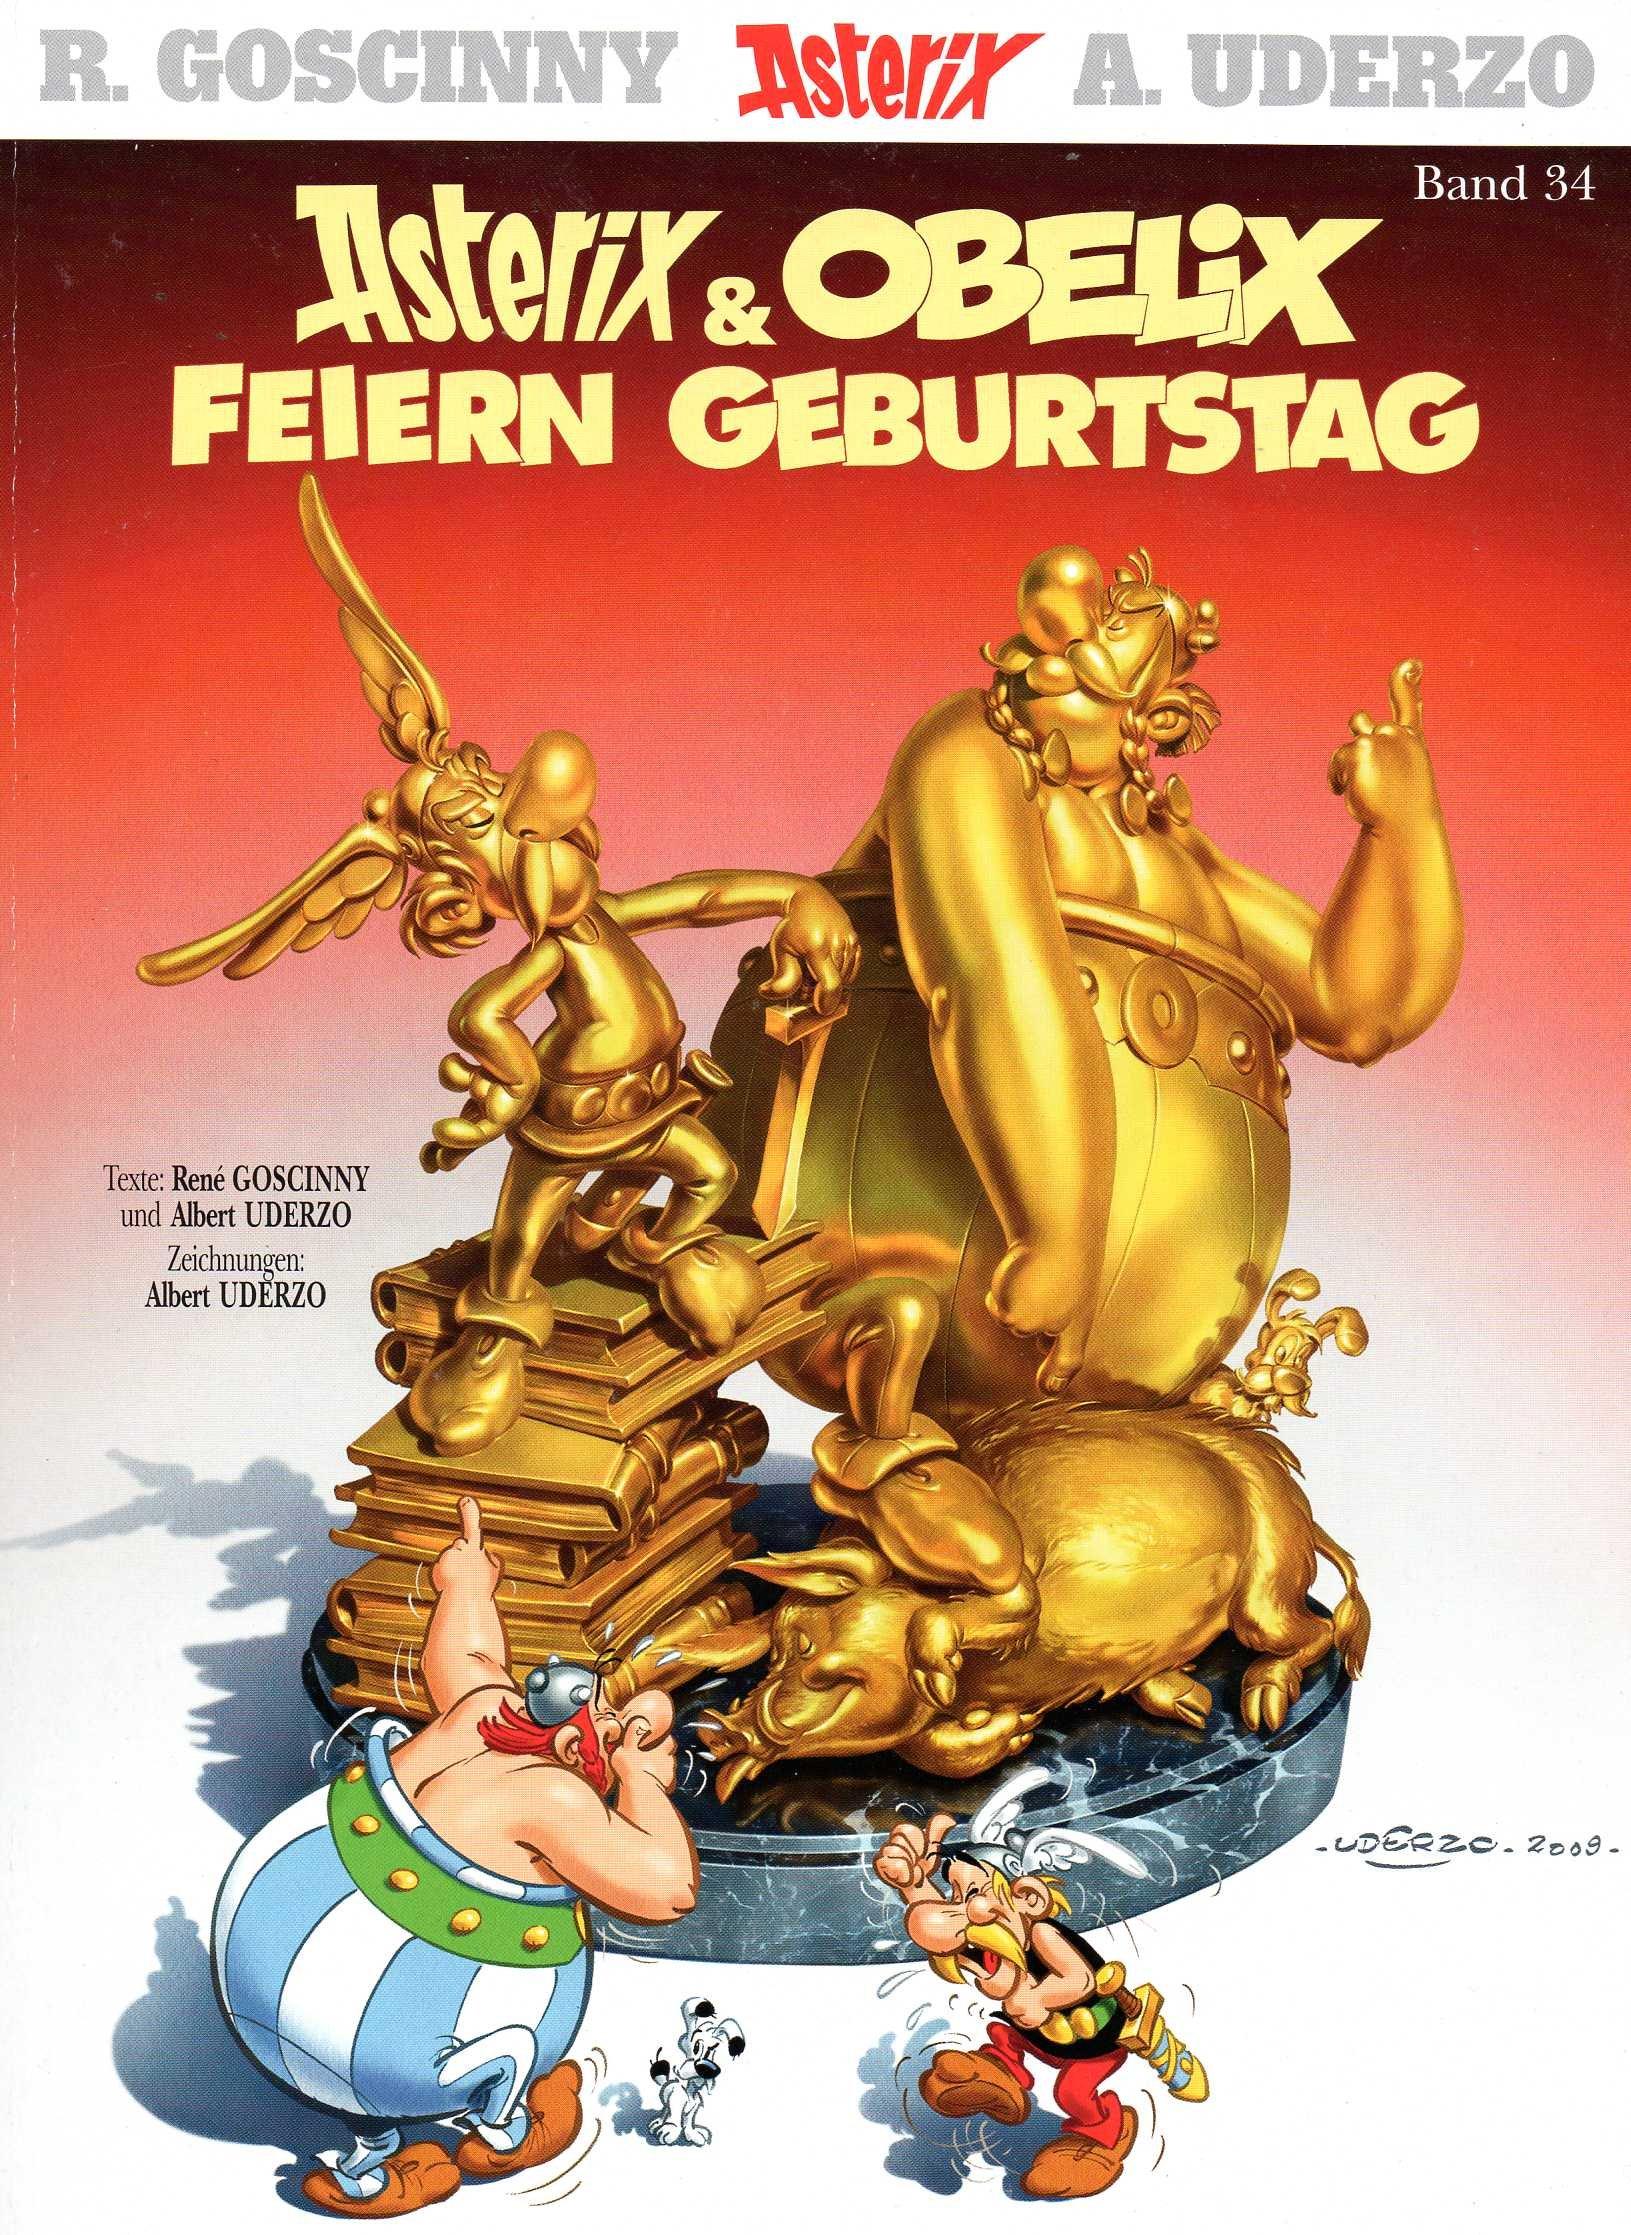 R. Goscinny, A. Uderzo ASTERIX Comic Album (Softcover) # 34: ASTERIX & OBELIX feiern Geburtstag!